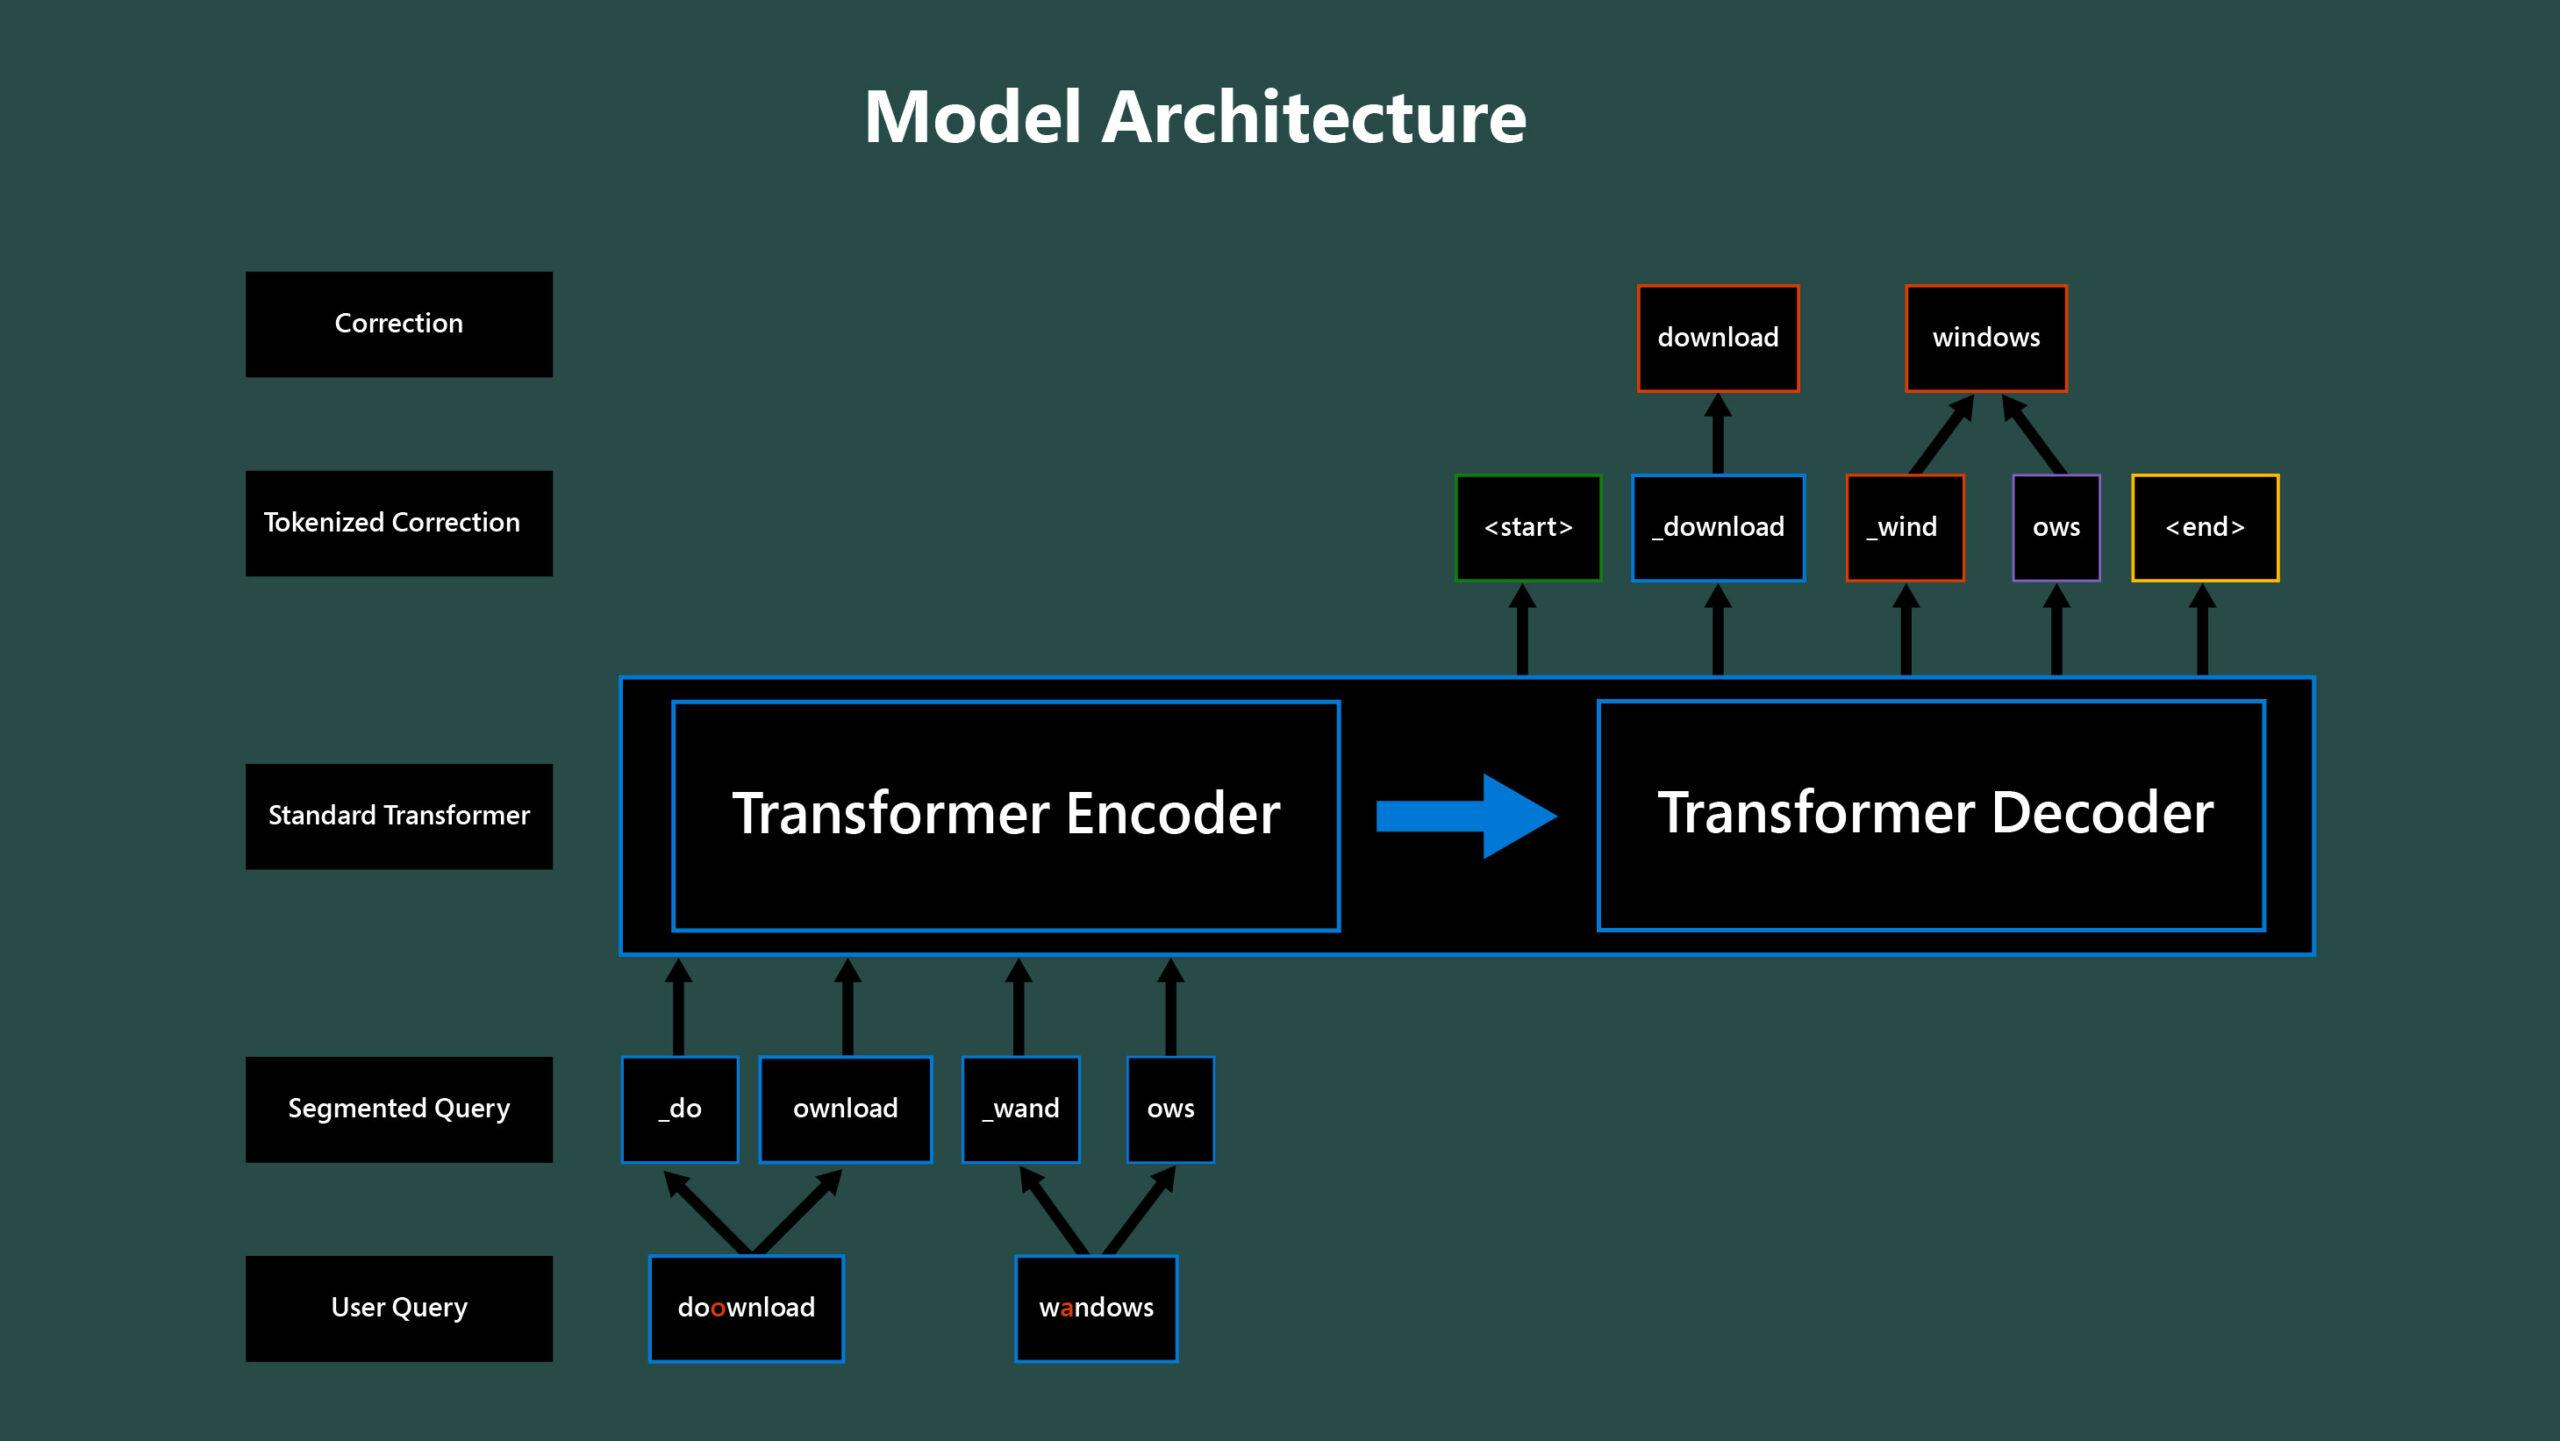 Diagram shows Model Architecture of Microsoft Vision Model ResNet-50